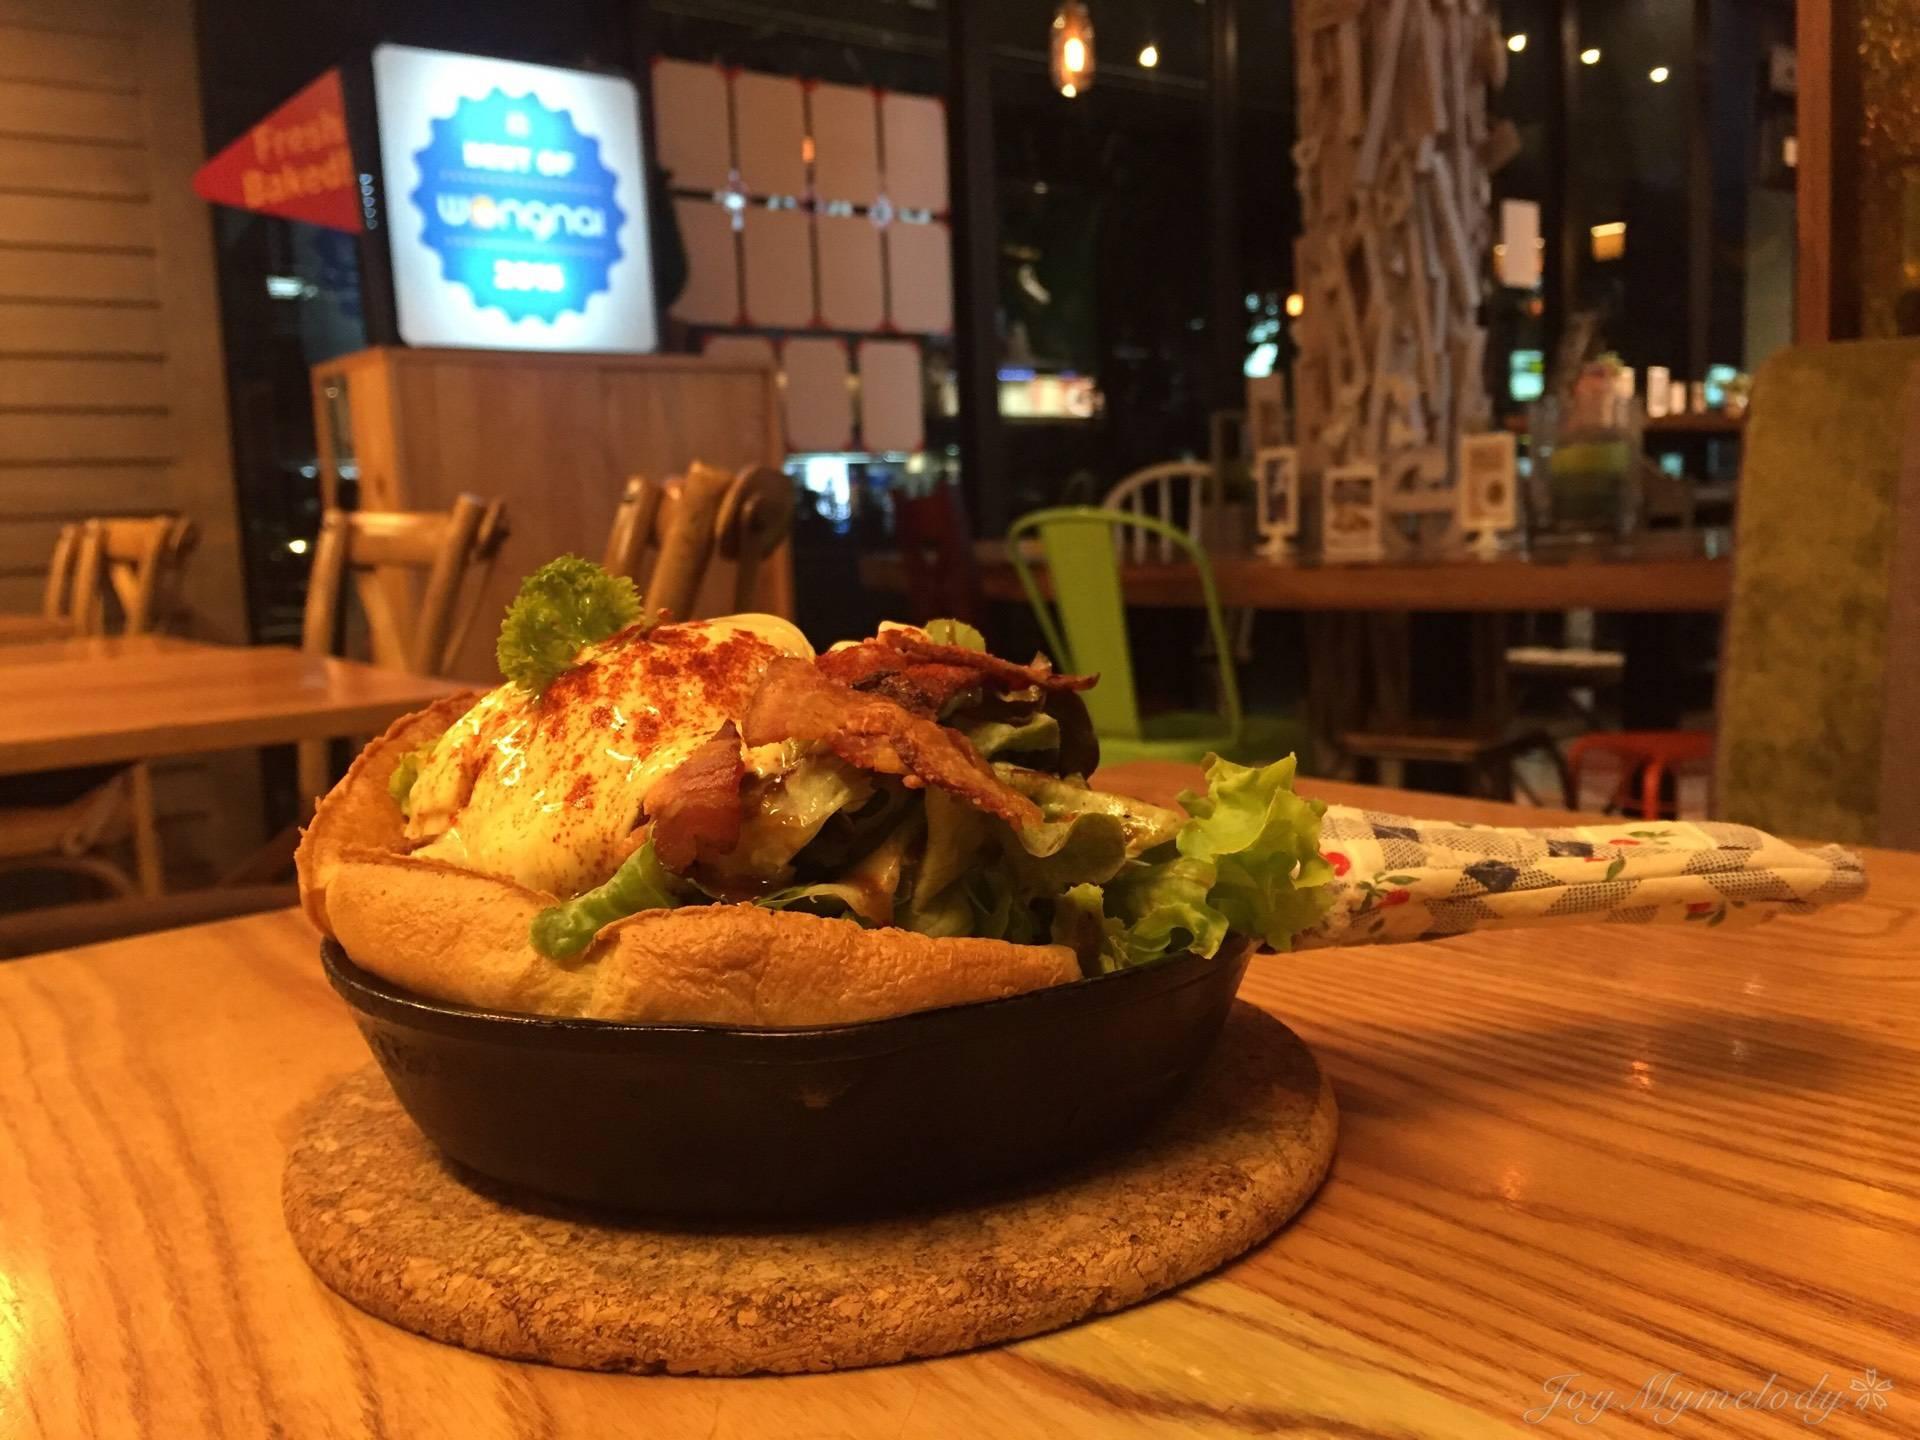 Poached Egg & Hollandaise Sauce • แชะมุมกว้างๆ ที่ ร้านอาหาร Panary Cafe